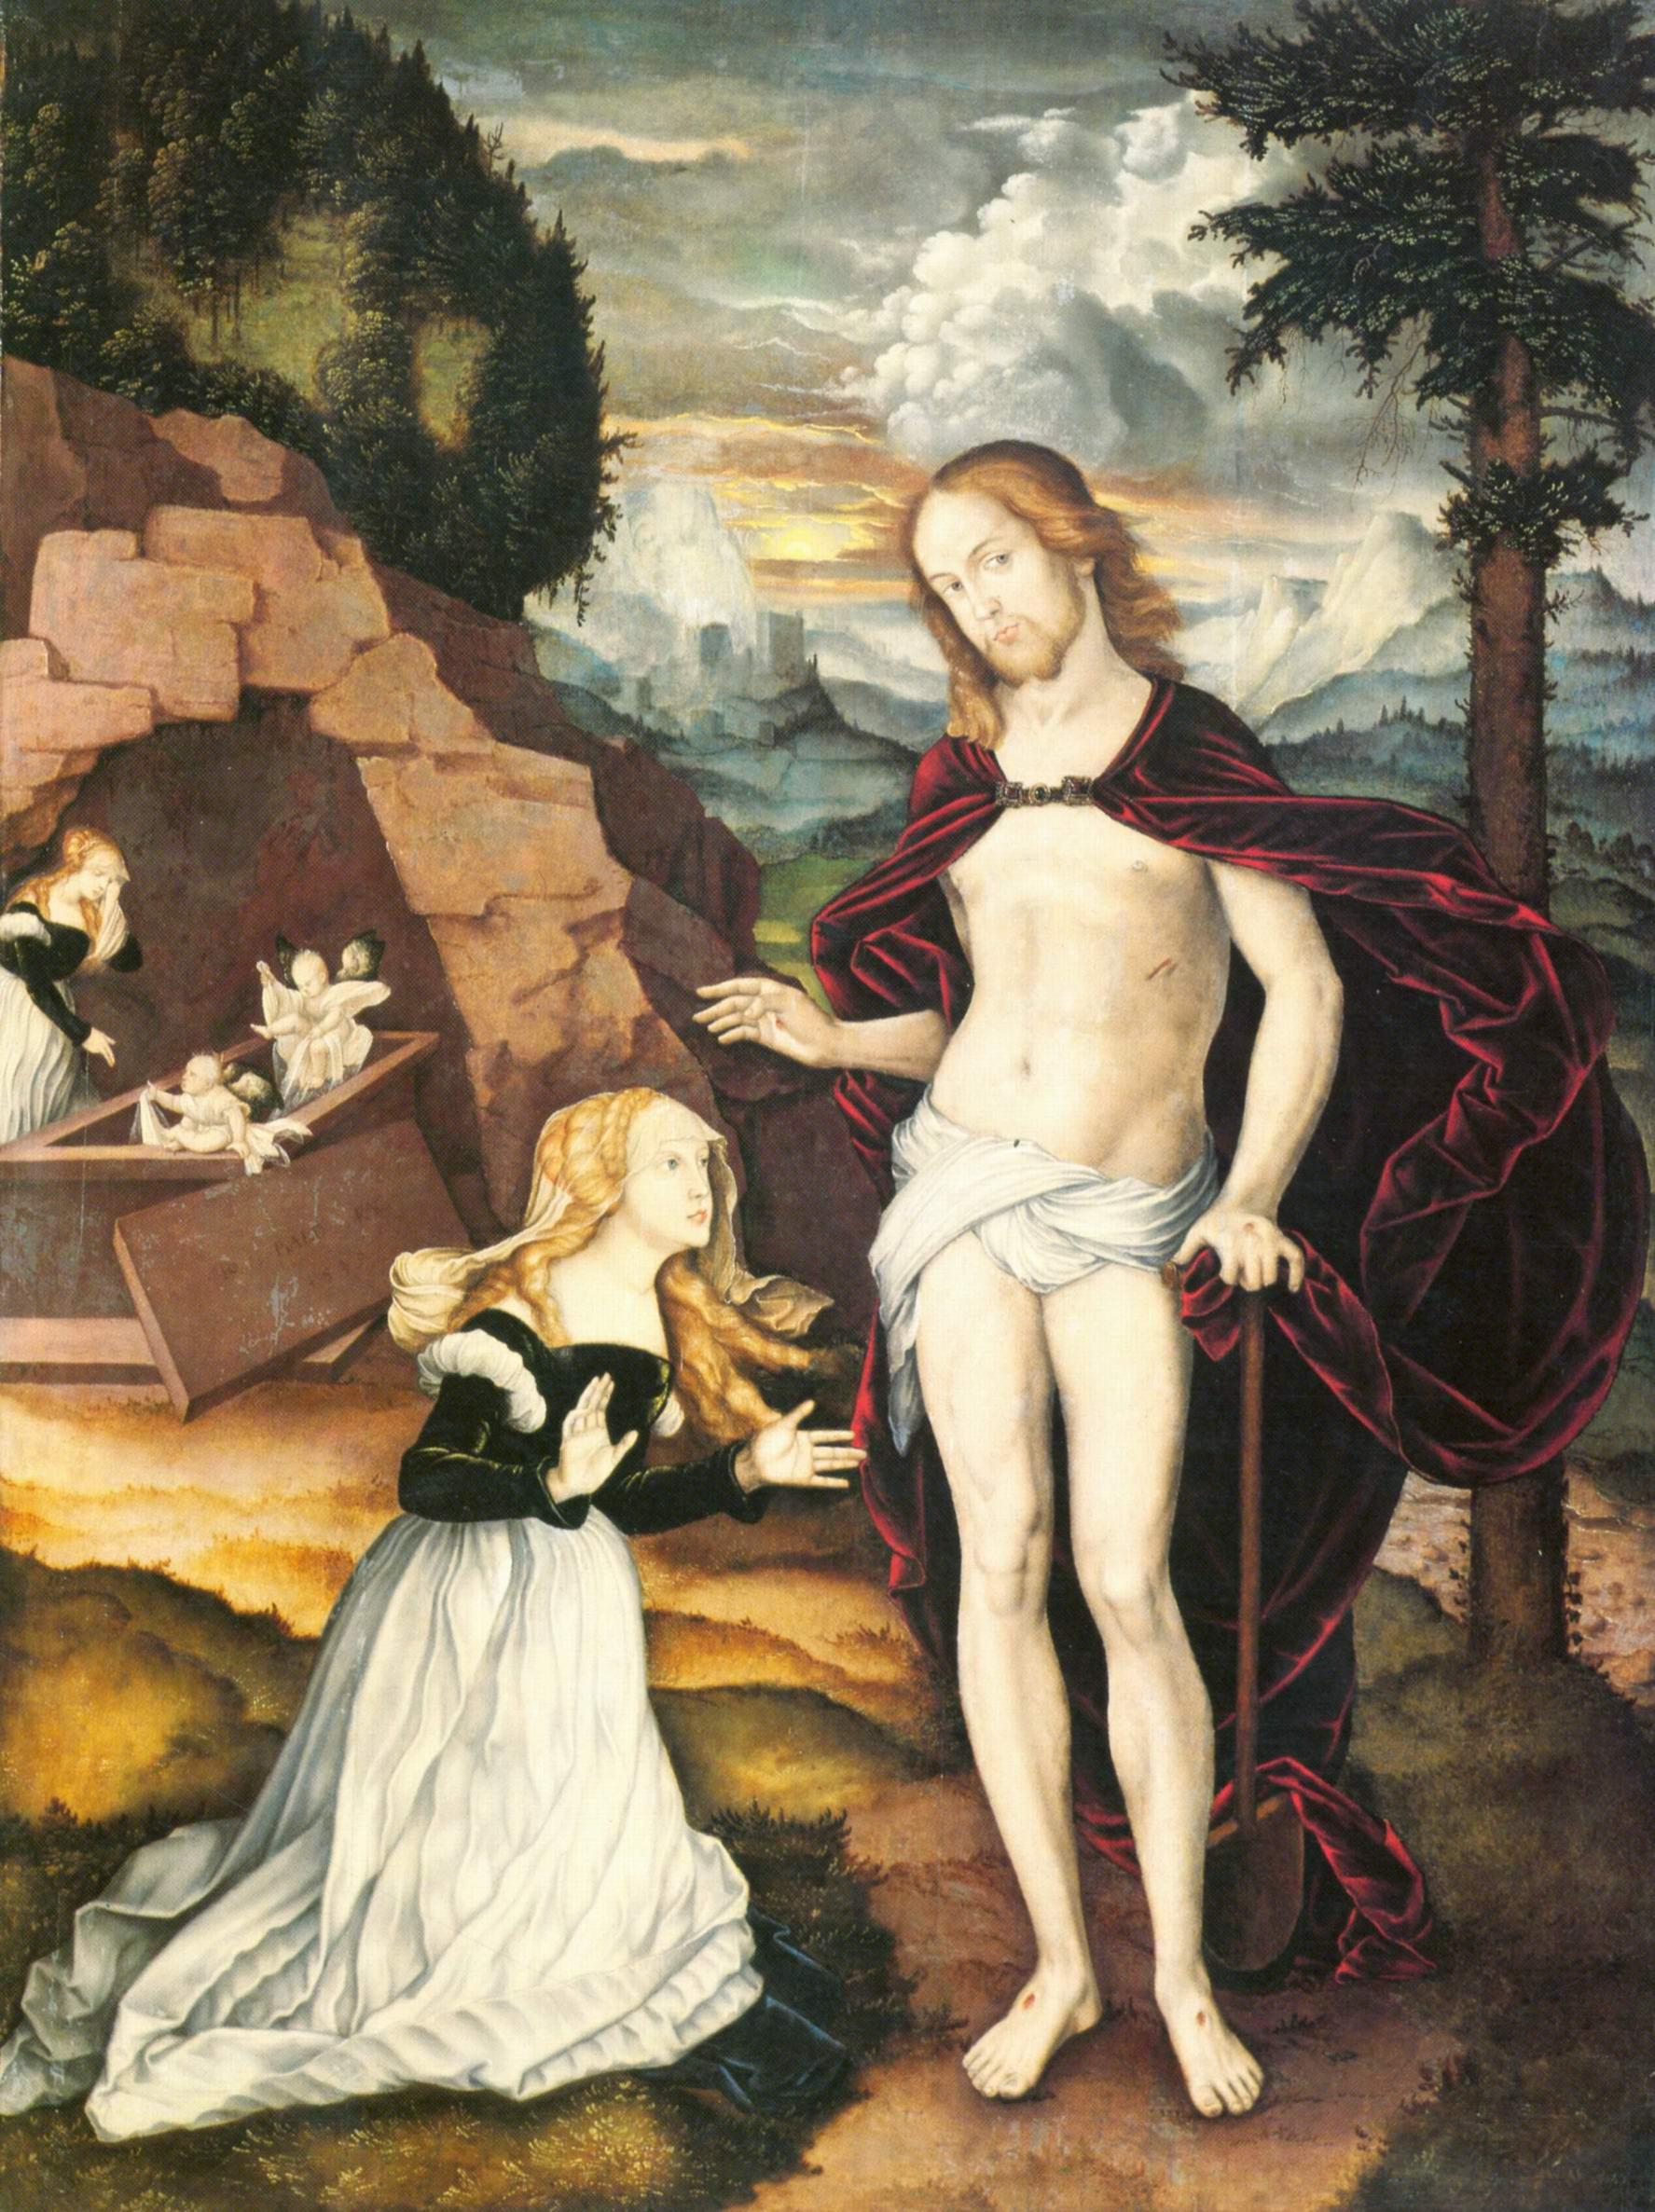 Бальдунг Ханс-Христос-садовник (Noli me tangere), Бальдунг Ханс